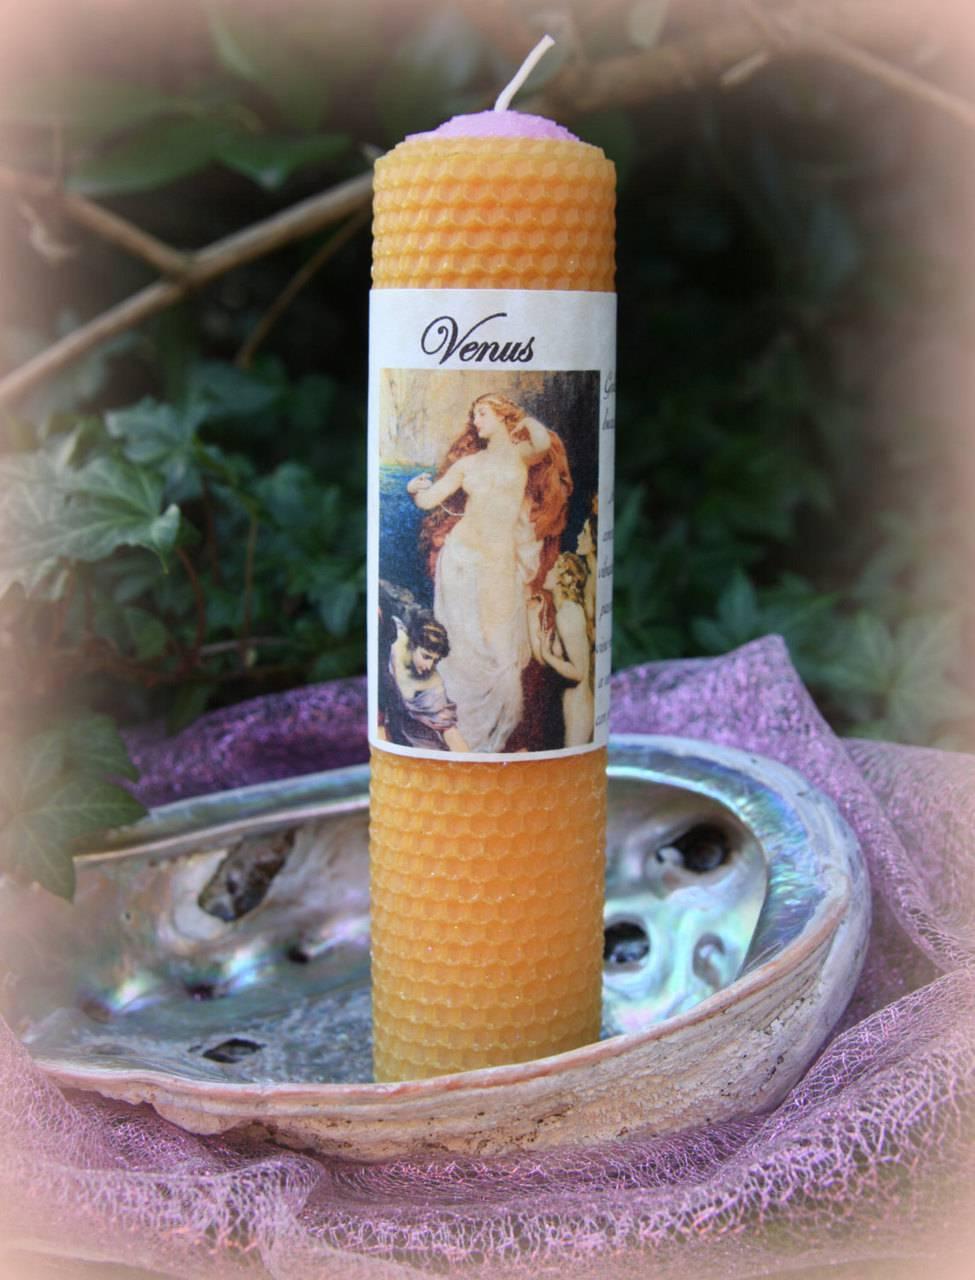 VENUS beeswax pillar candle - love